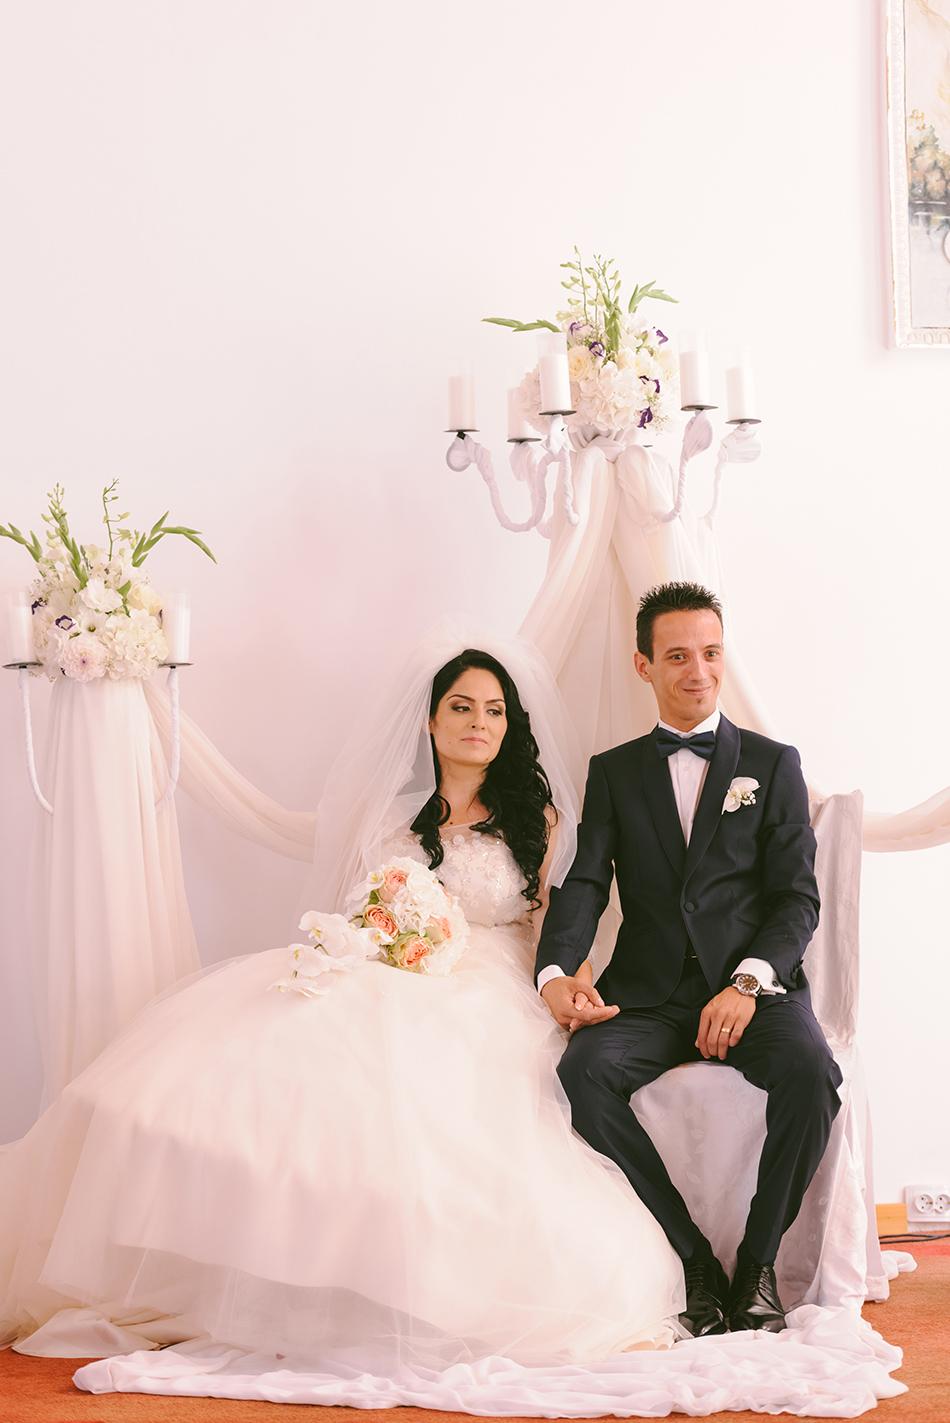 AD Passion Photography | ad-passion_diana-si-gabi_fotograf-nunta-suceava_0096 | Adelin, Dida, fotograf profesionist, fotograf de nunta, fotografie de nunta, fotograf Timisoara, fotograf Craiova, fotograf Bucuresti, fotograf Arad, nunta Timisoara, nunta Arad, nunta Bucuresti, nunta Craiova